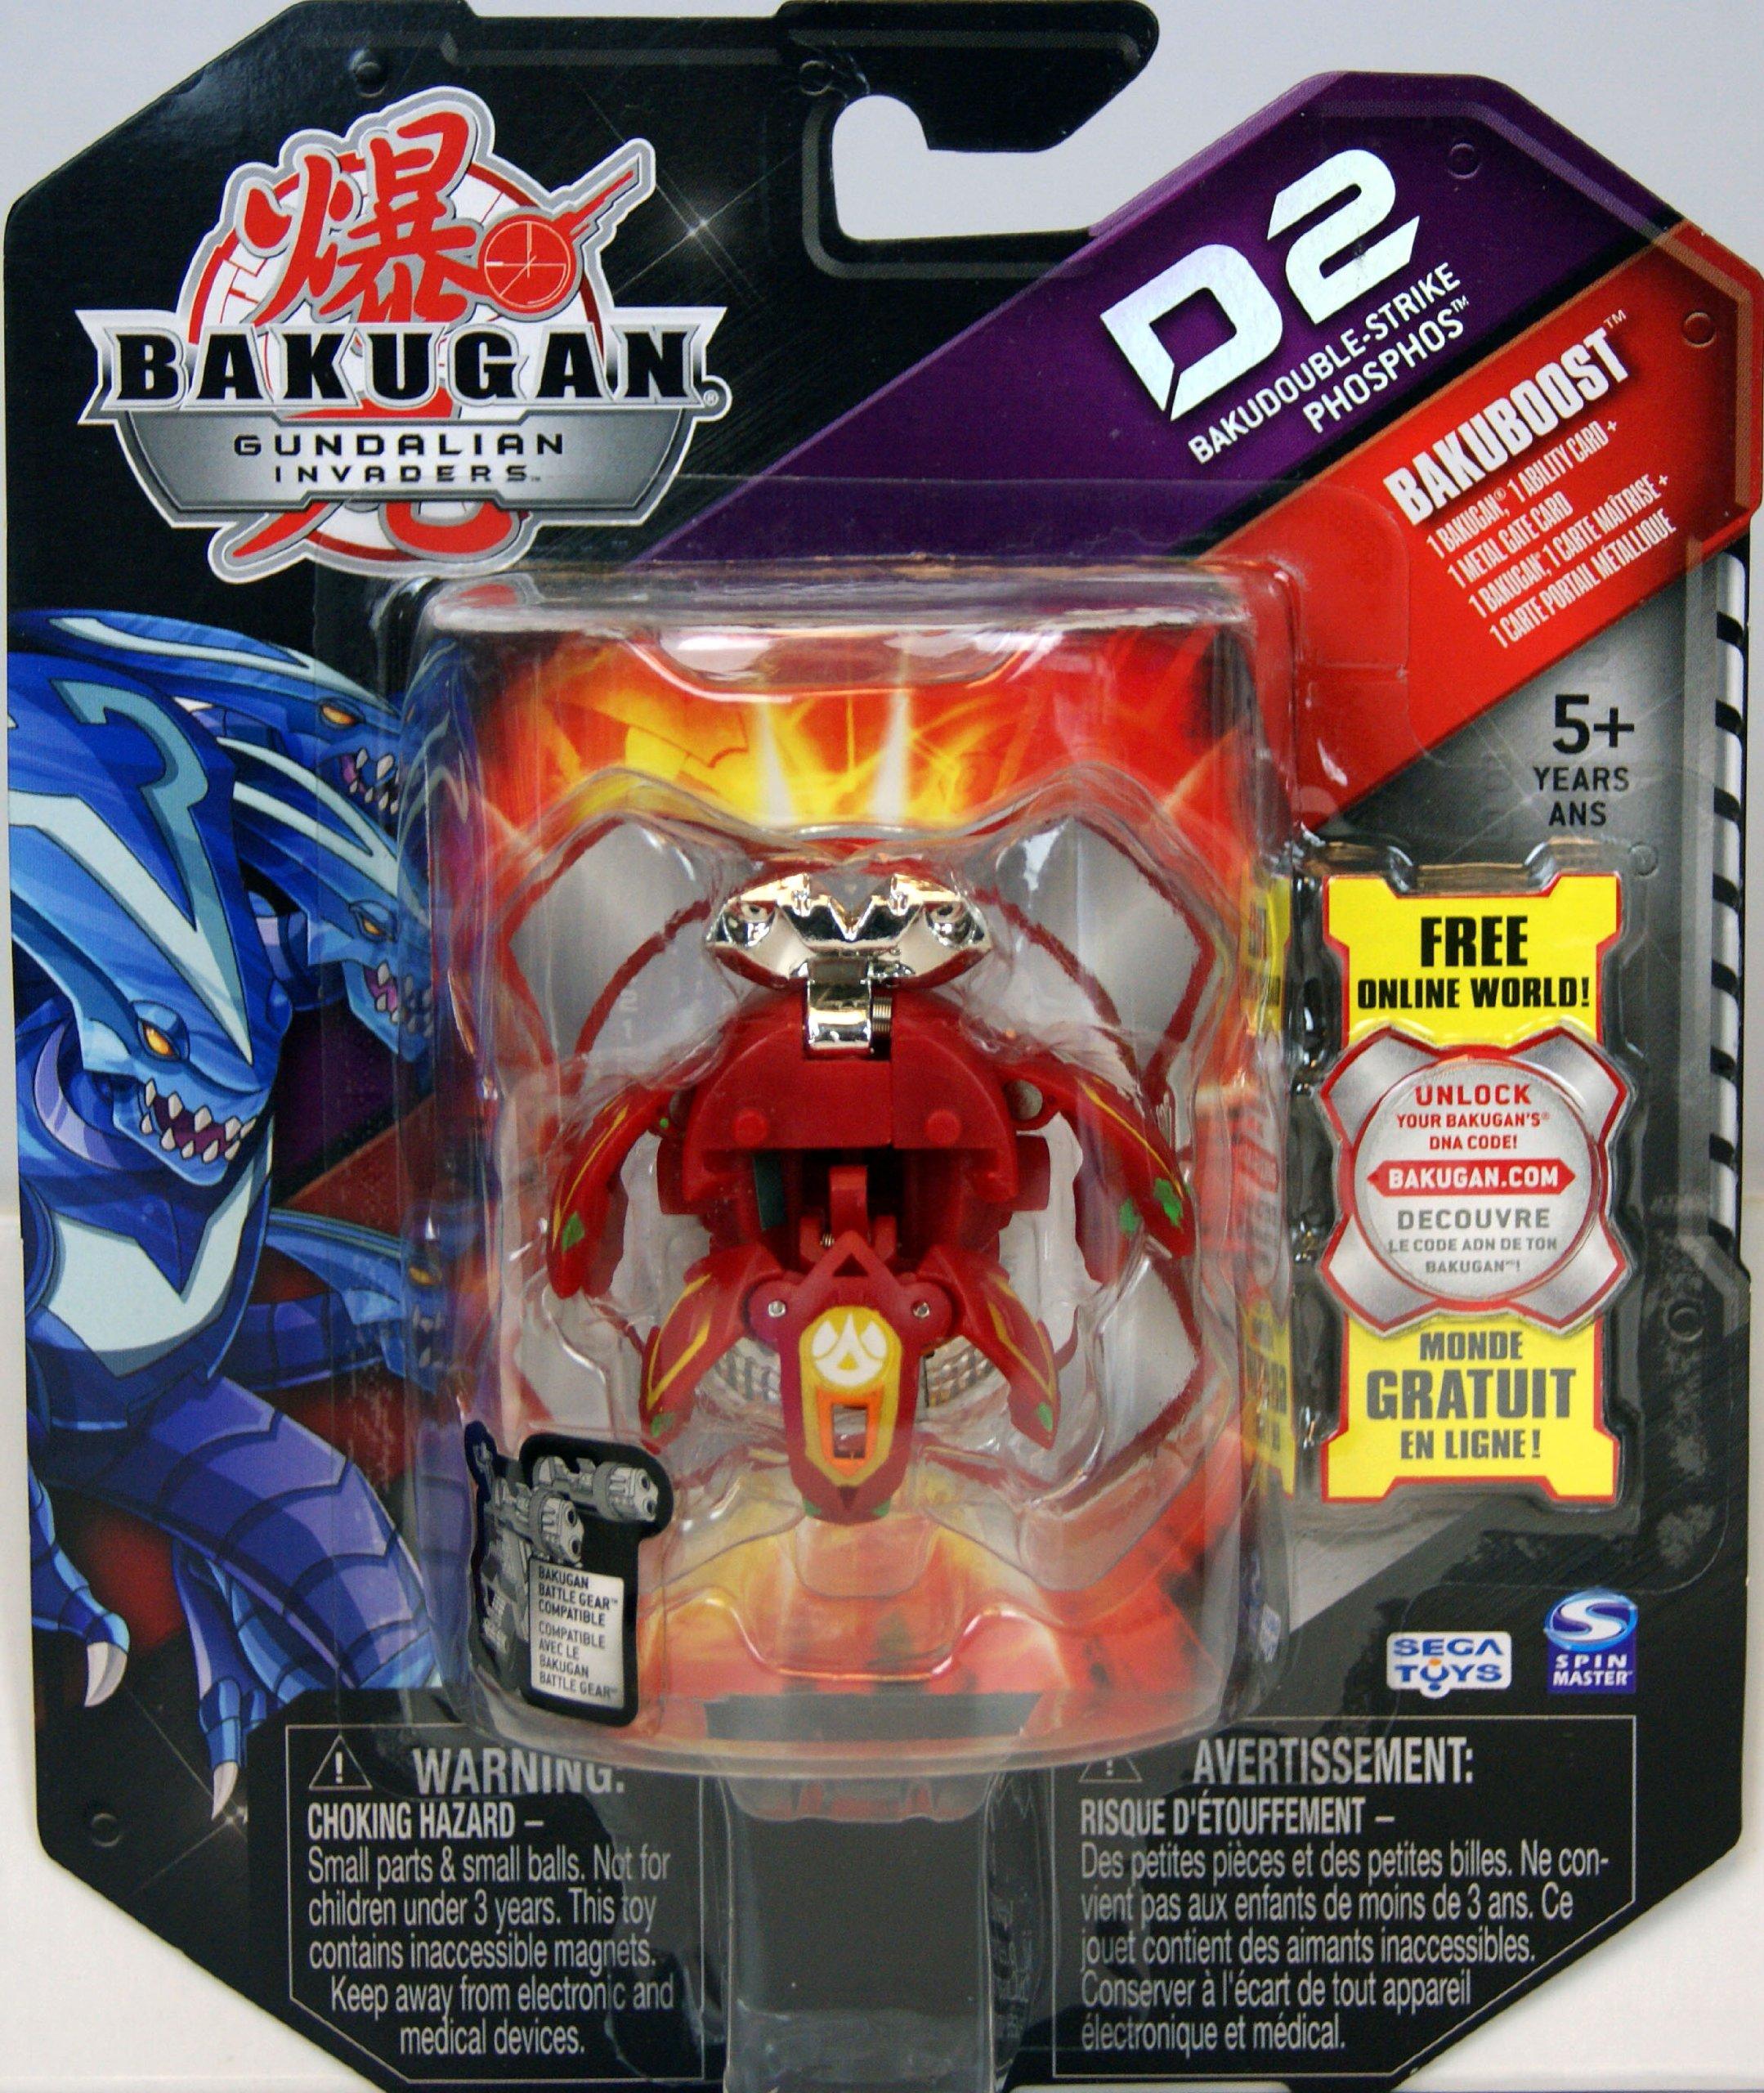 Bakugan Gundalian Invaders Deka Boomix Season 3 avec bakucoin Toy